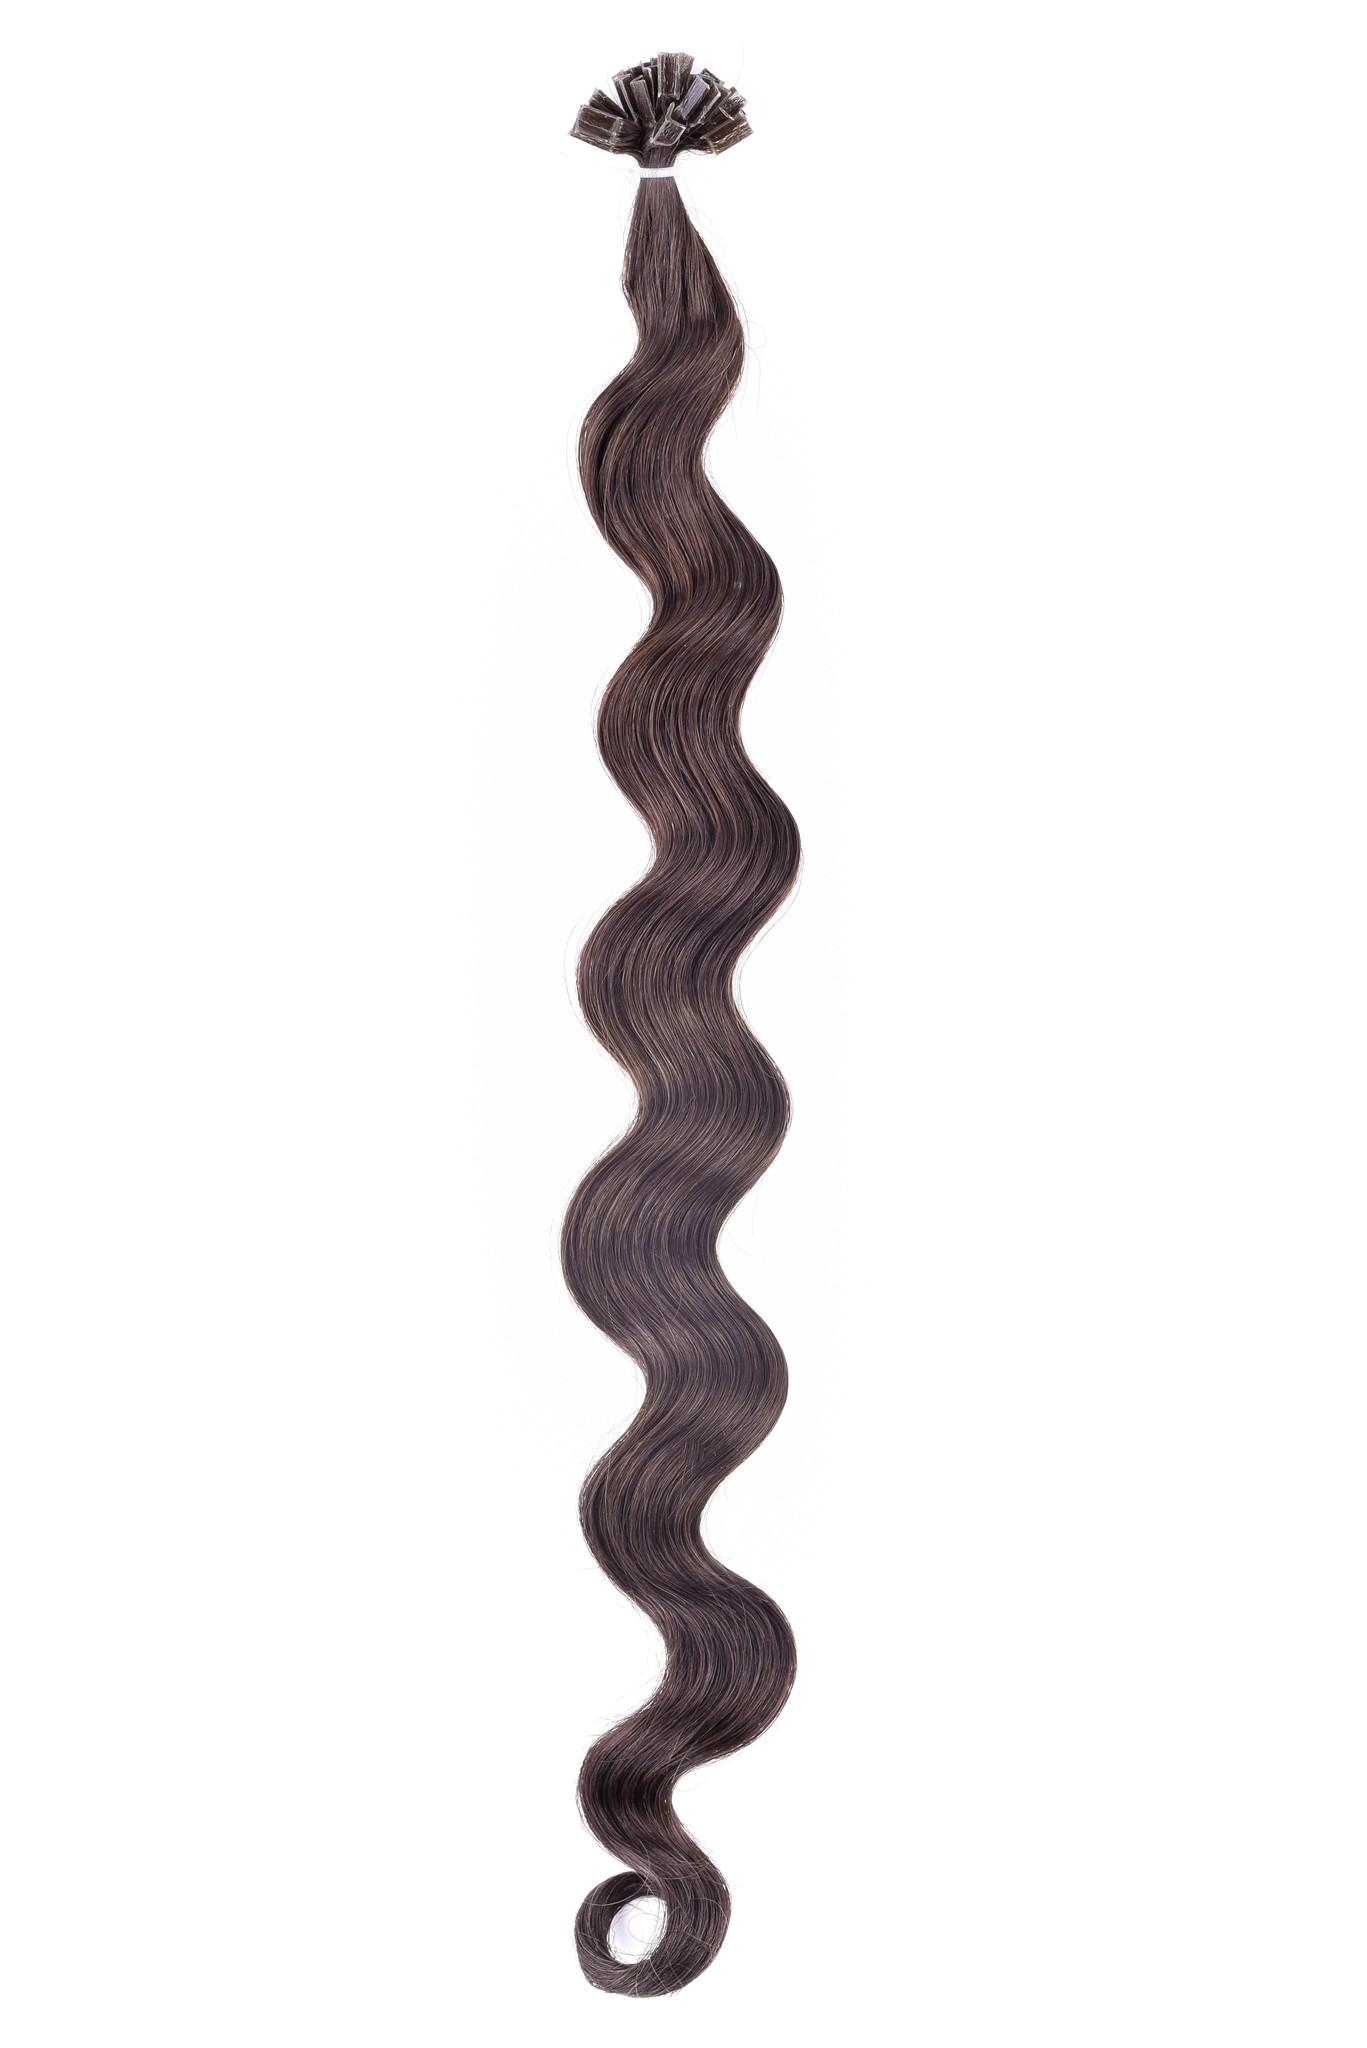 SilverFox Wax Extensions - Loose Wave 55cm